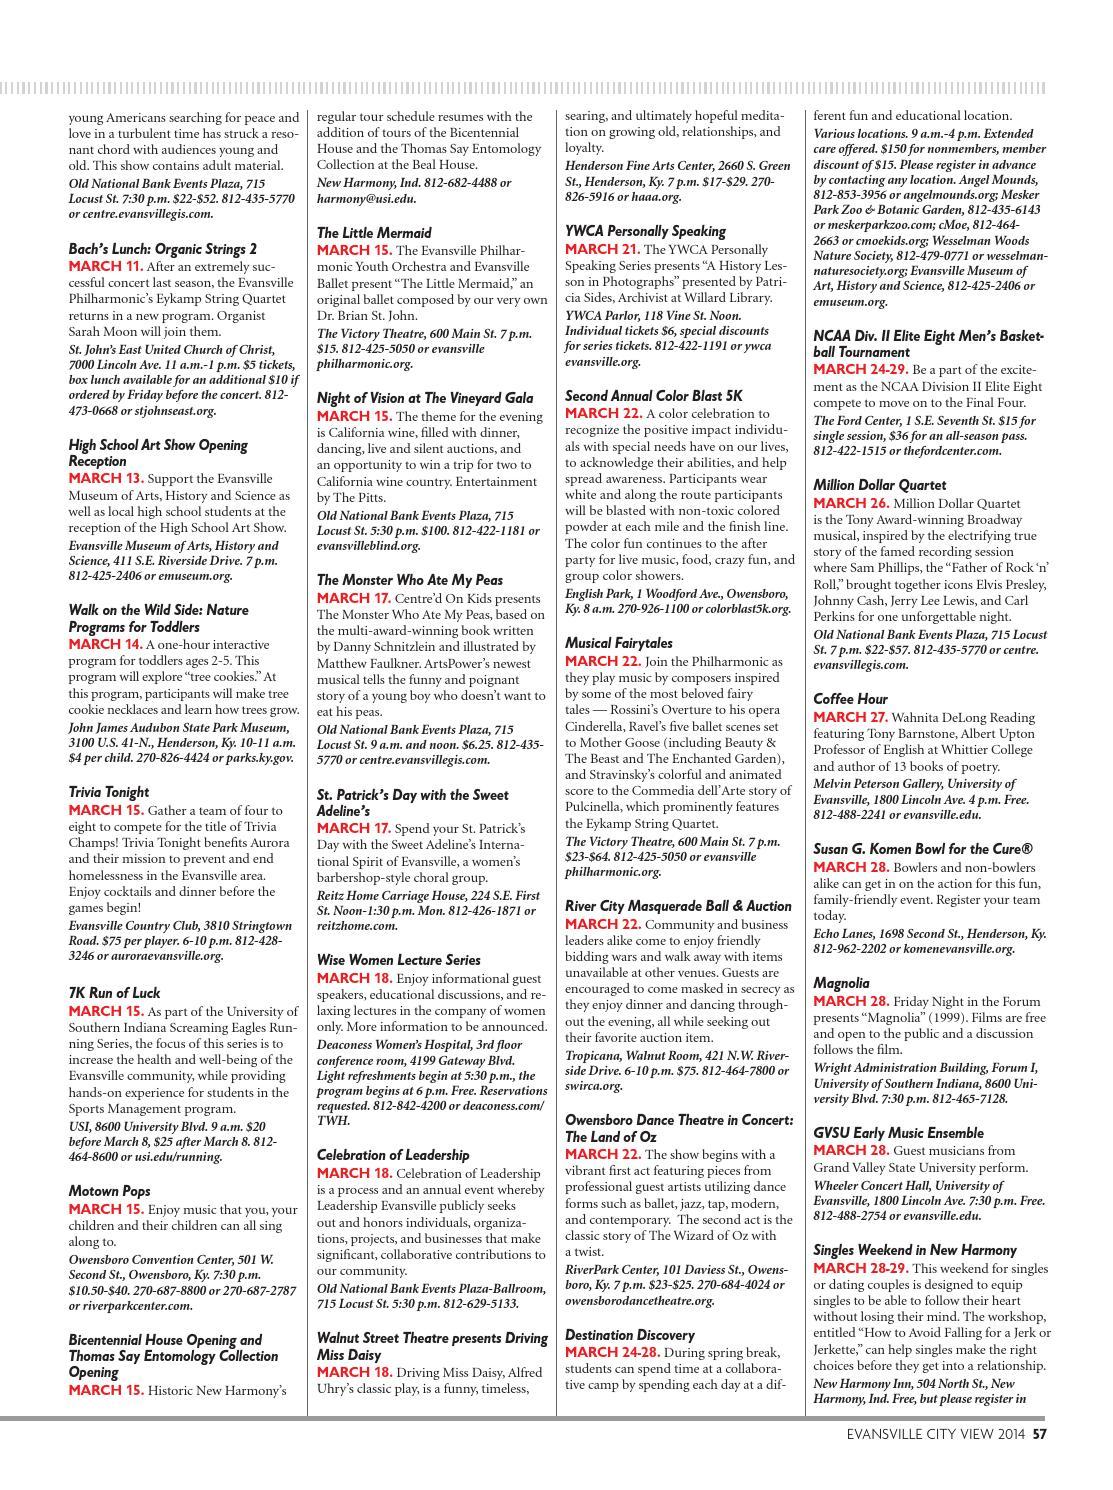 Evansville City View 2014 by Evansville Living Magazine - issuu